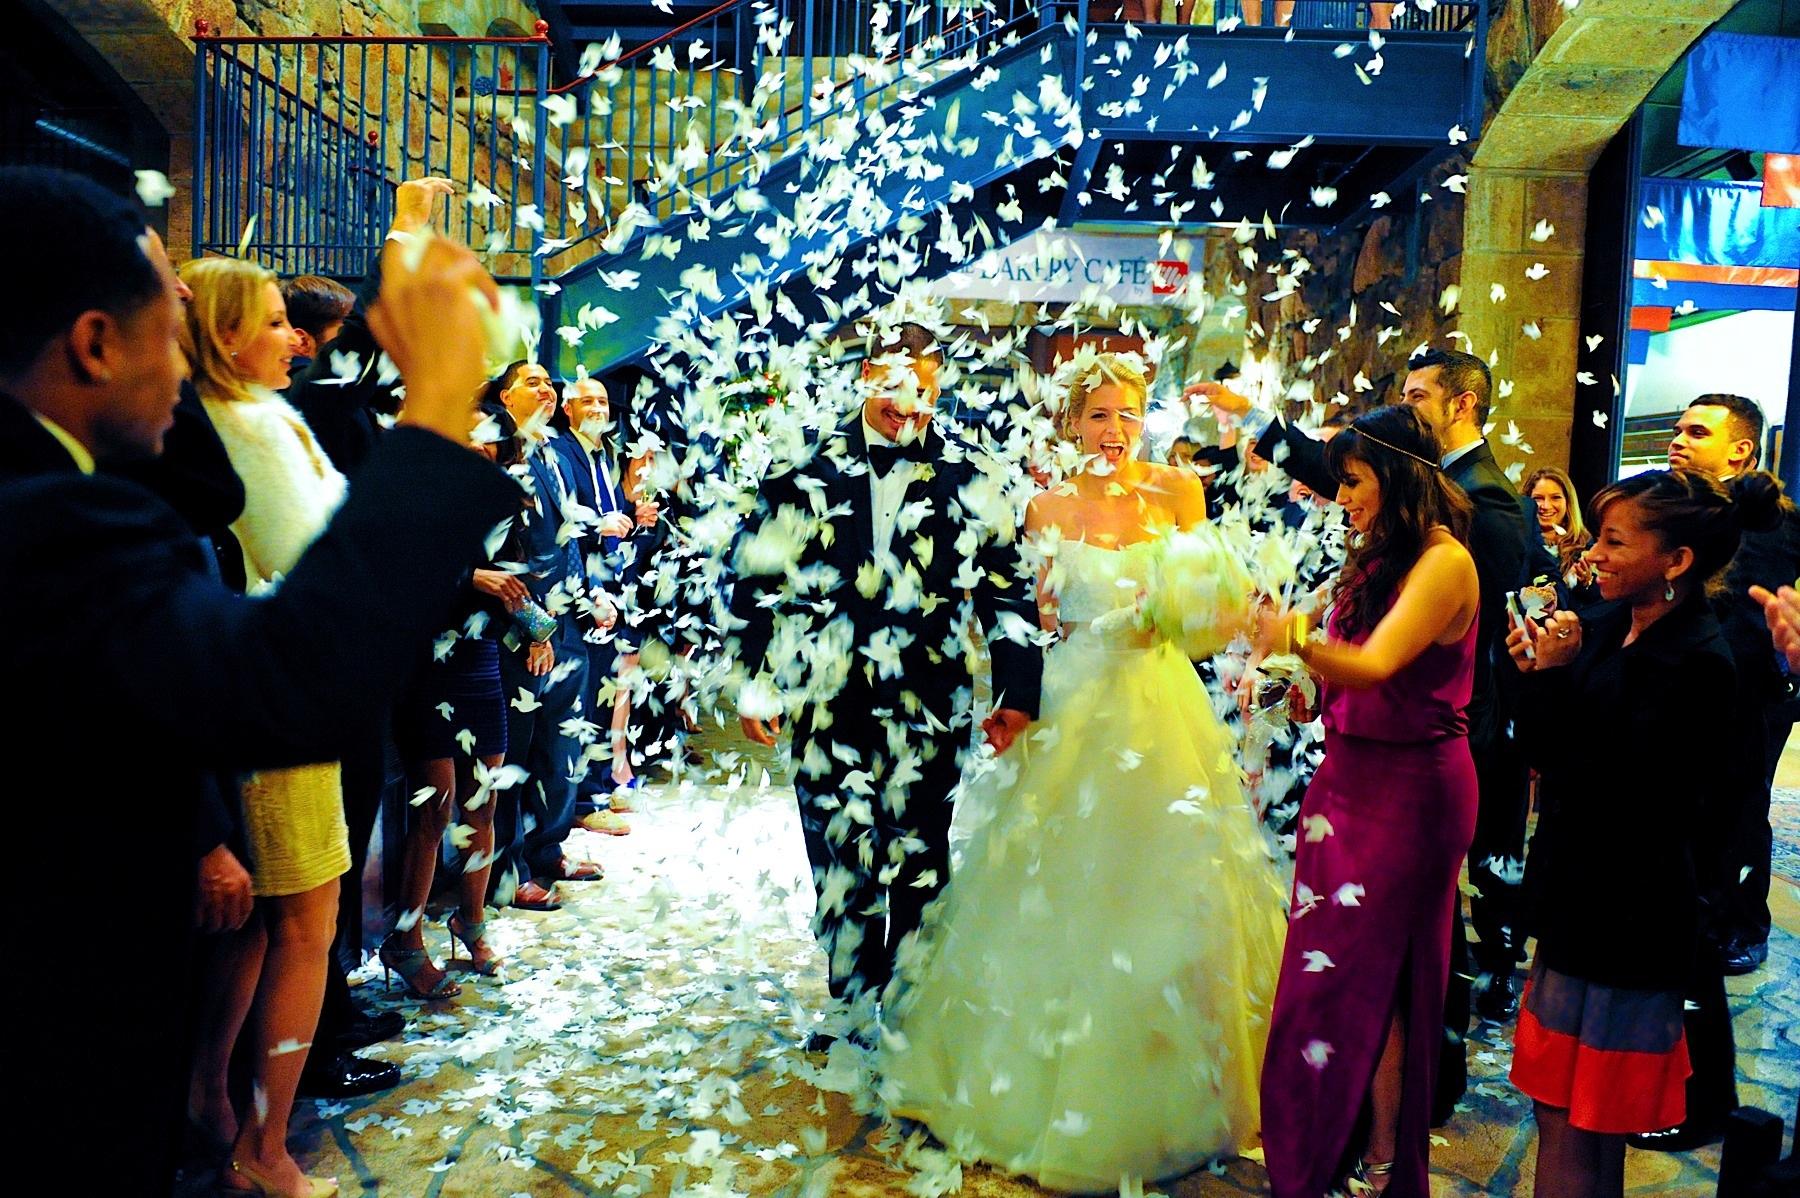 culinary_institute_of_america_napa_valley_wedding_133photographer_